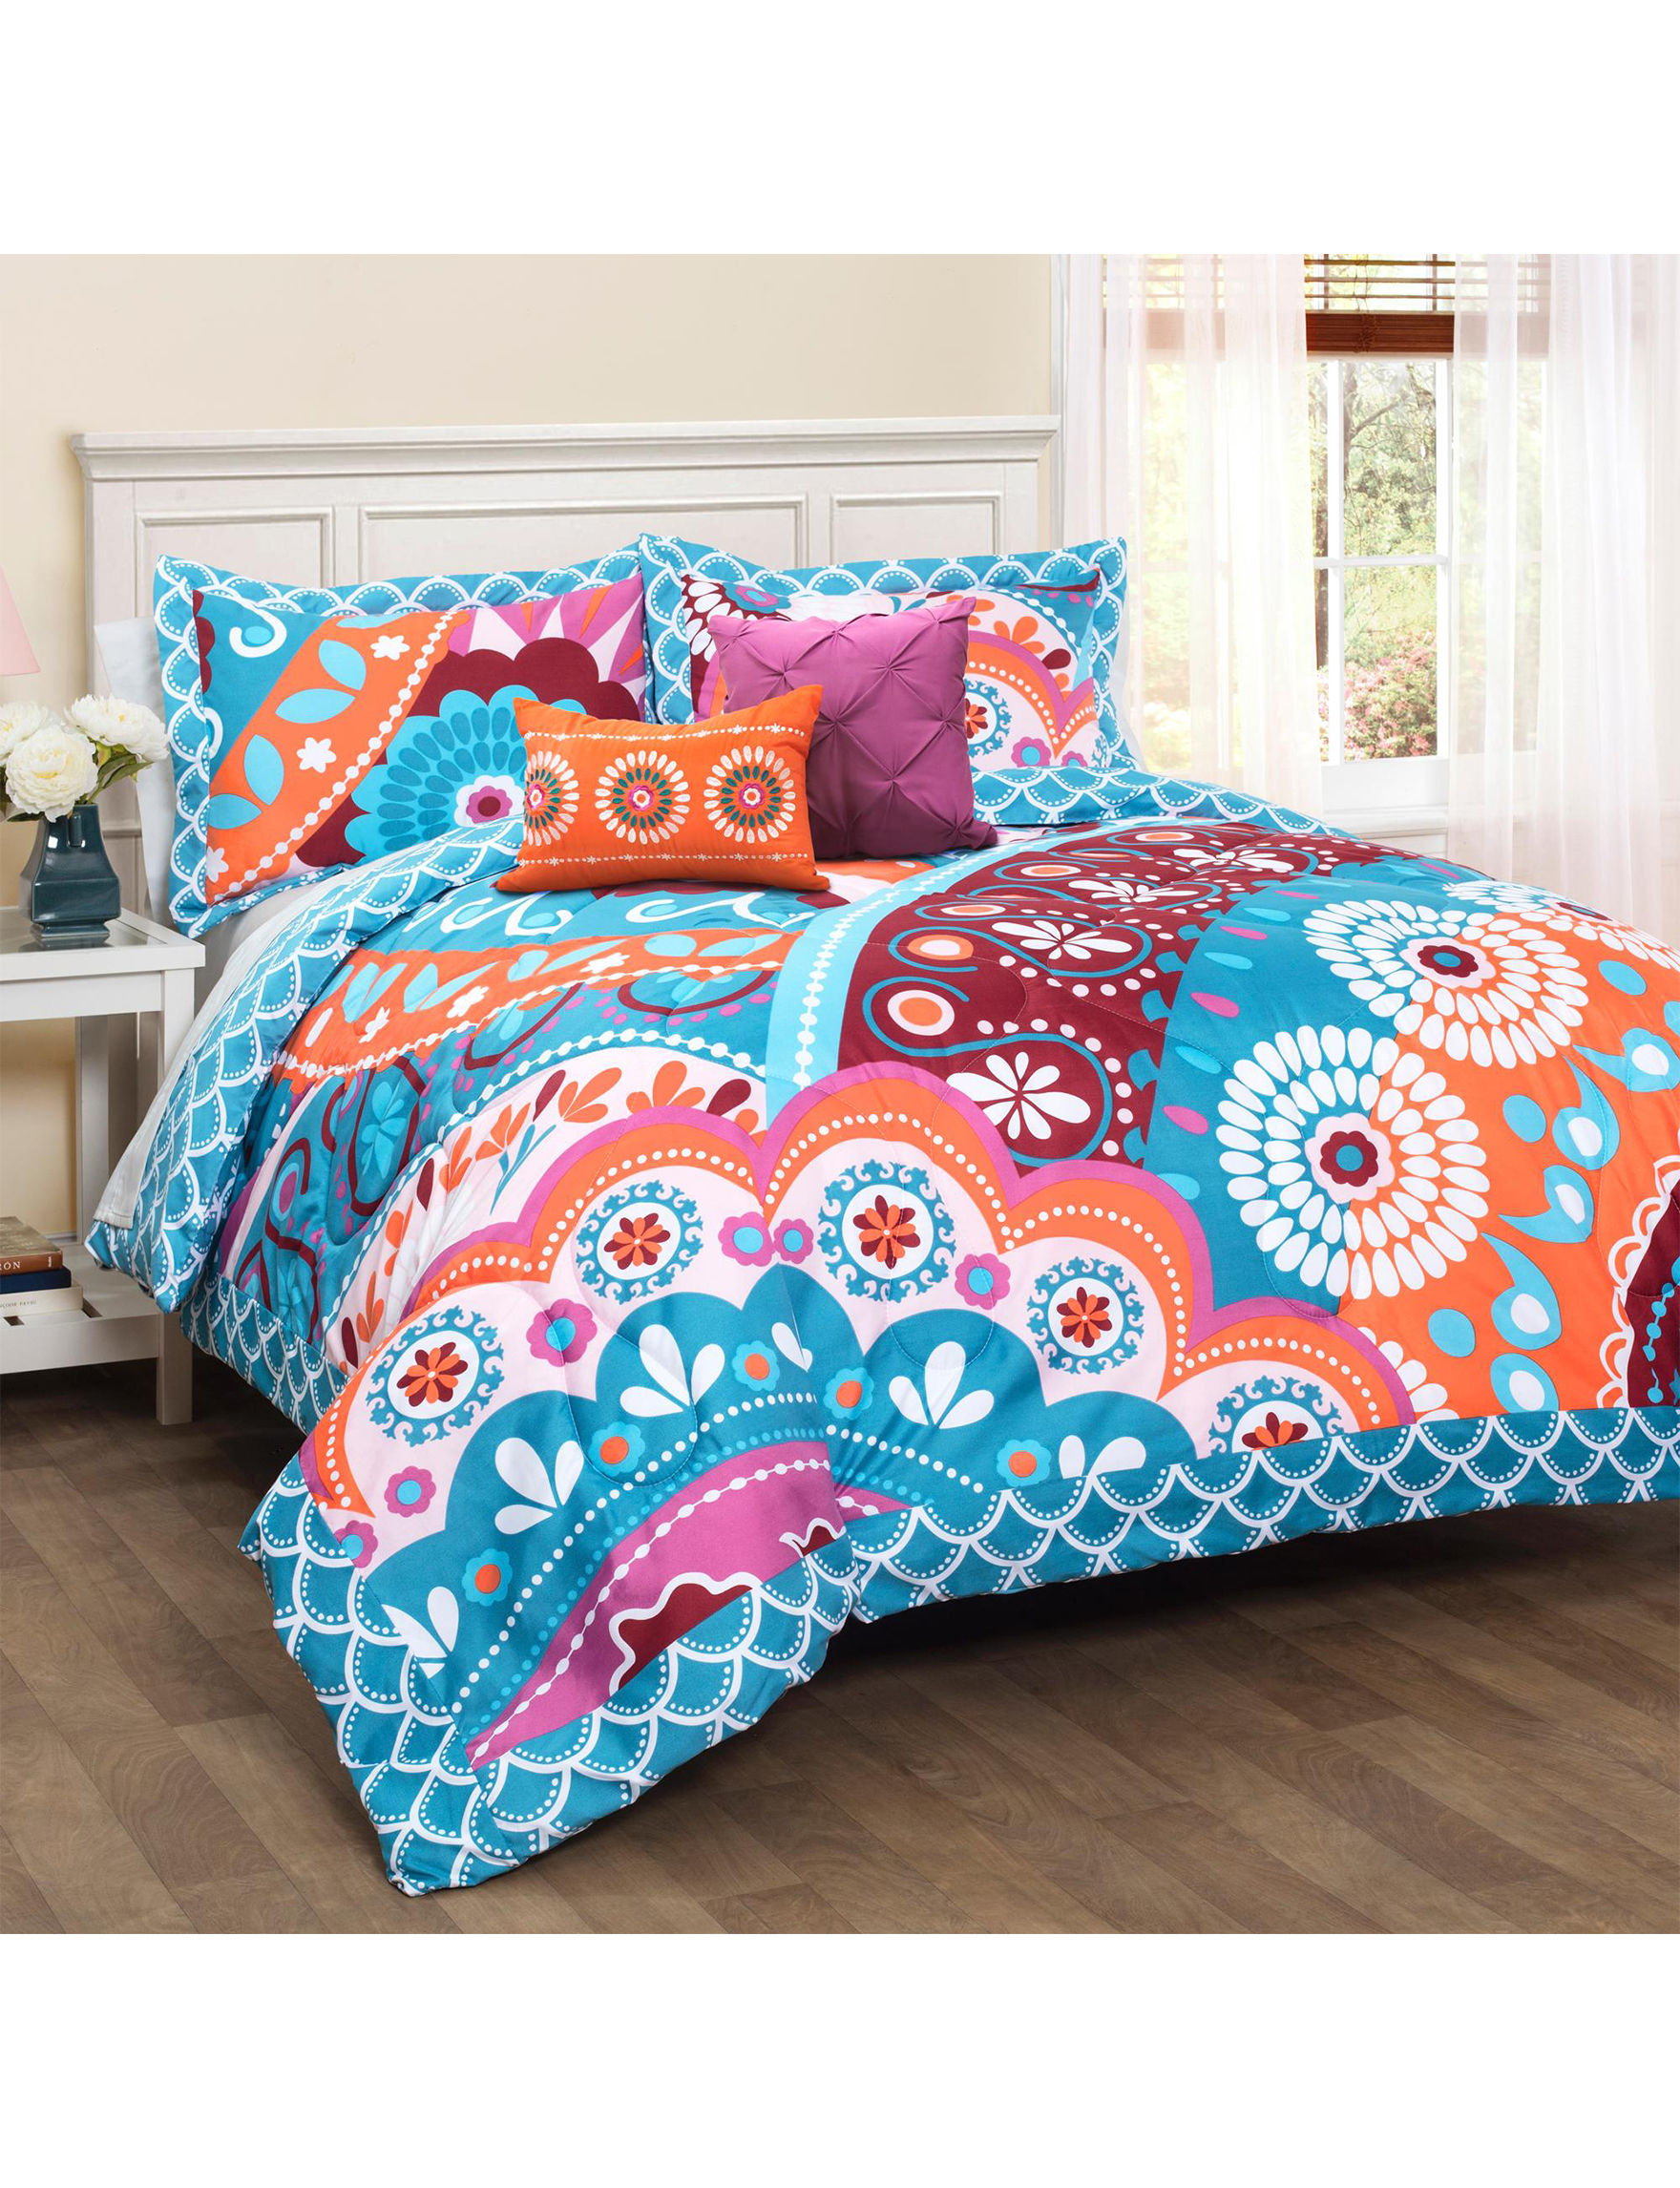 Lush Decor Pink / Blue Comforters & Comforter Sets